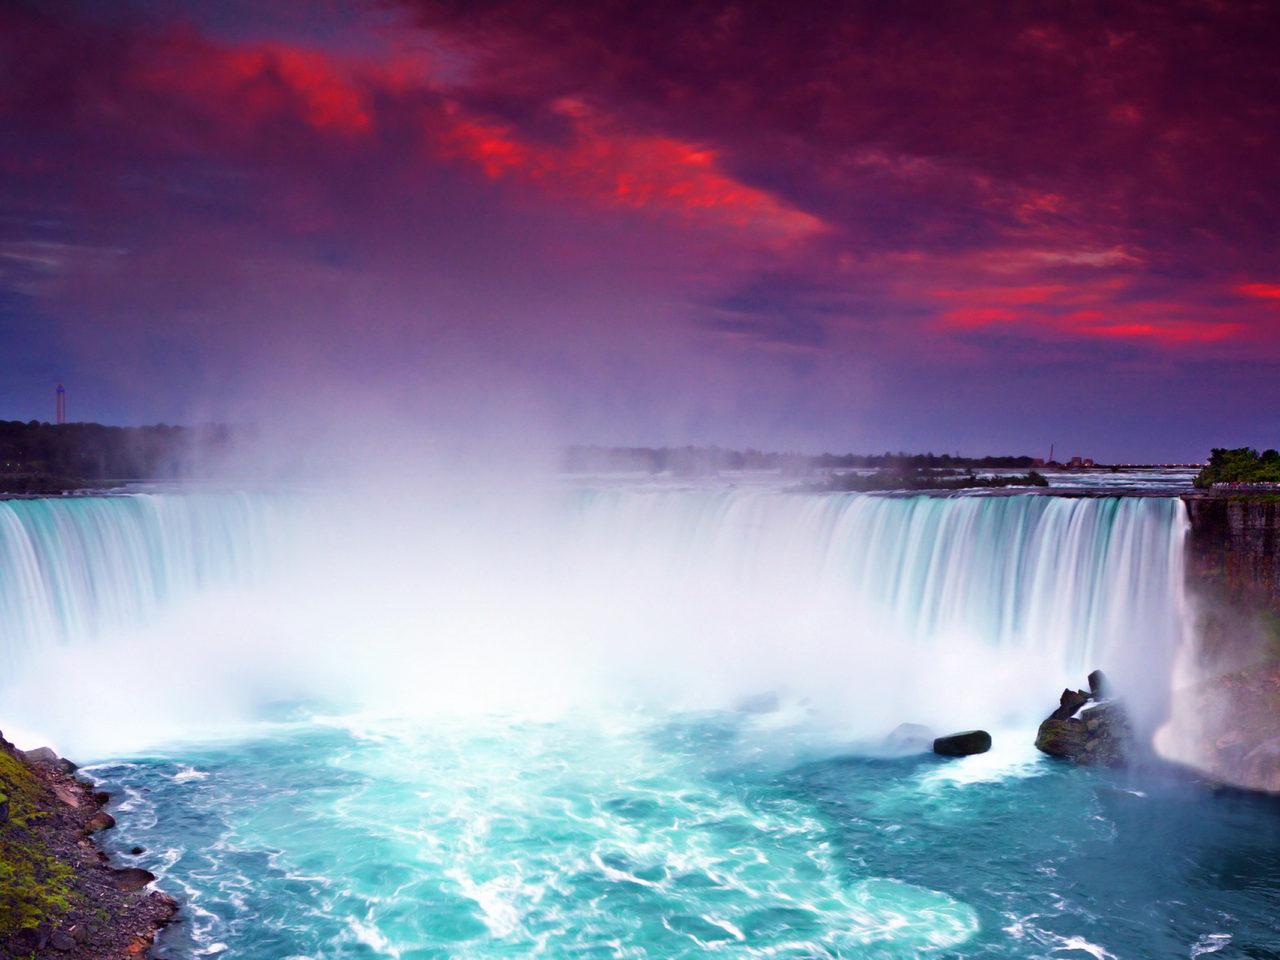 Canada Wallpaper Hd Iphone Niagara Falls At Night Lights Hd Wallpaper For Desktop